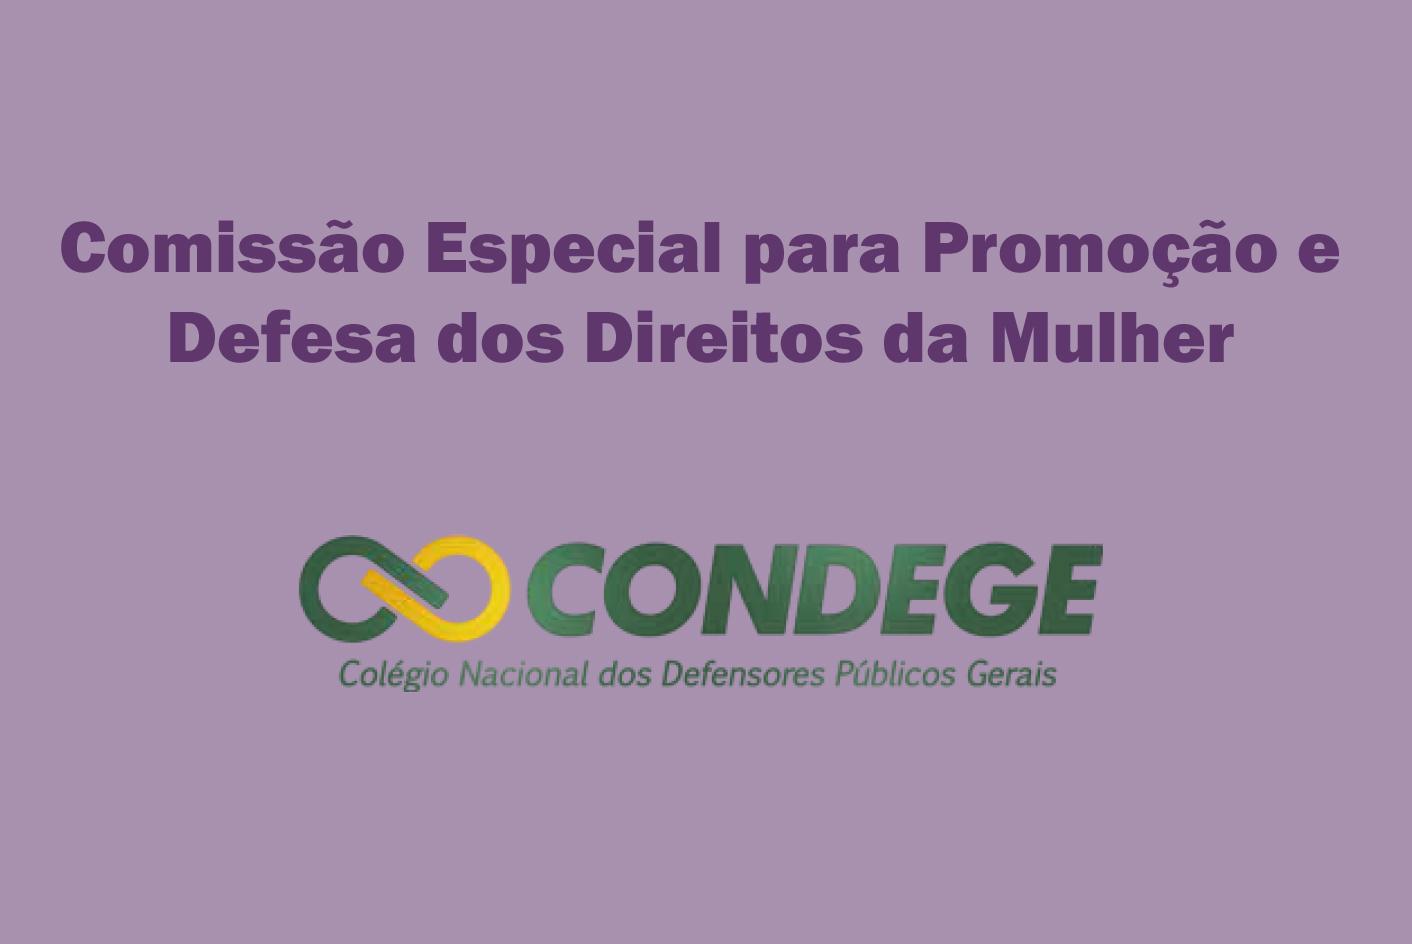 CDDM Condege